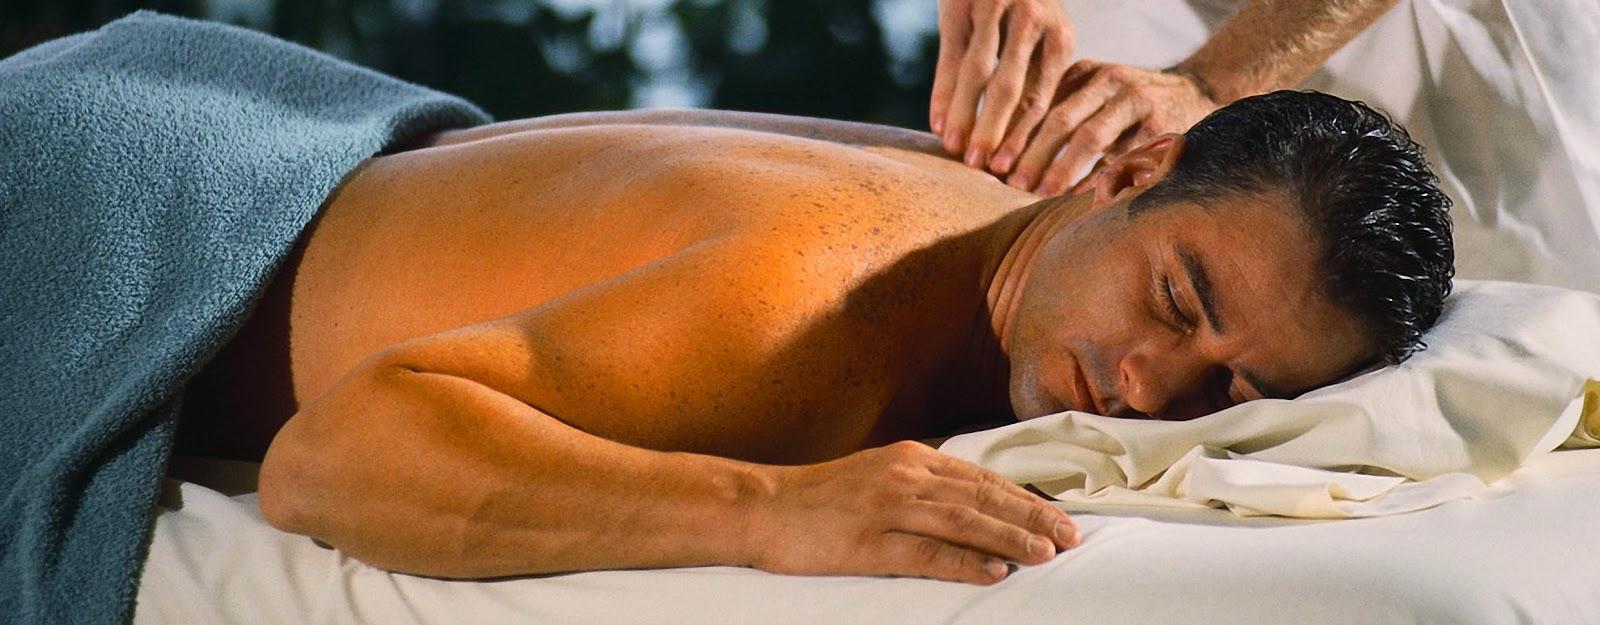 Jasa Terapi Pijat | Urut | Massage | Tradisional Surabaya